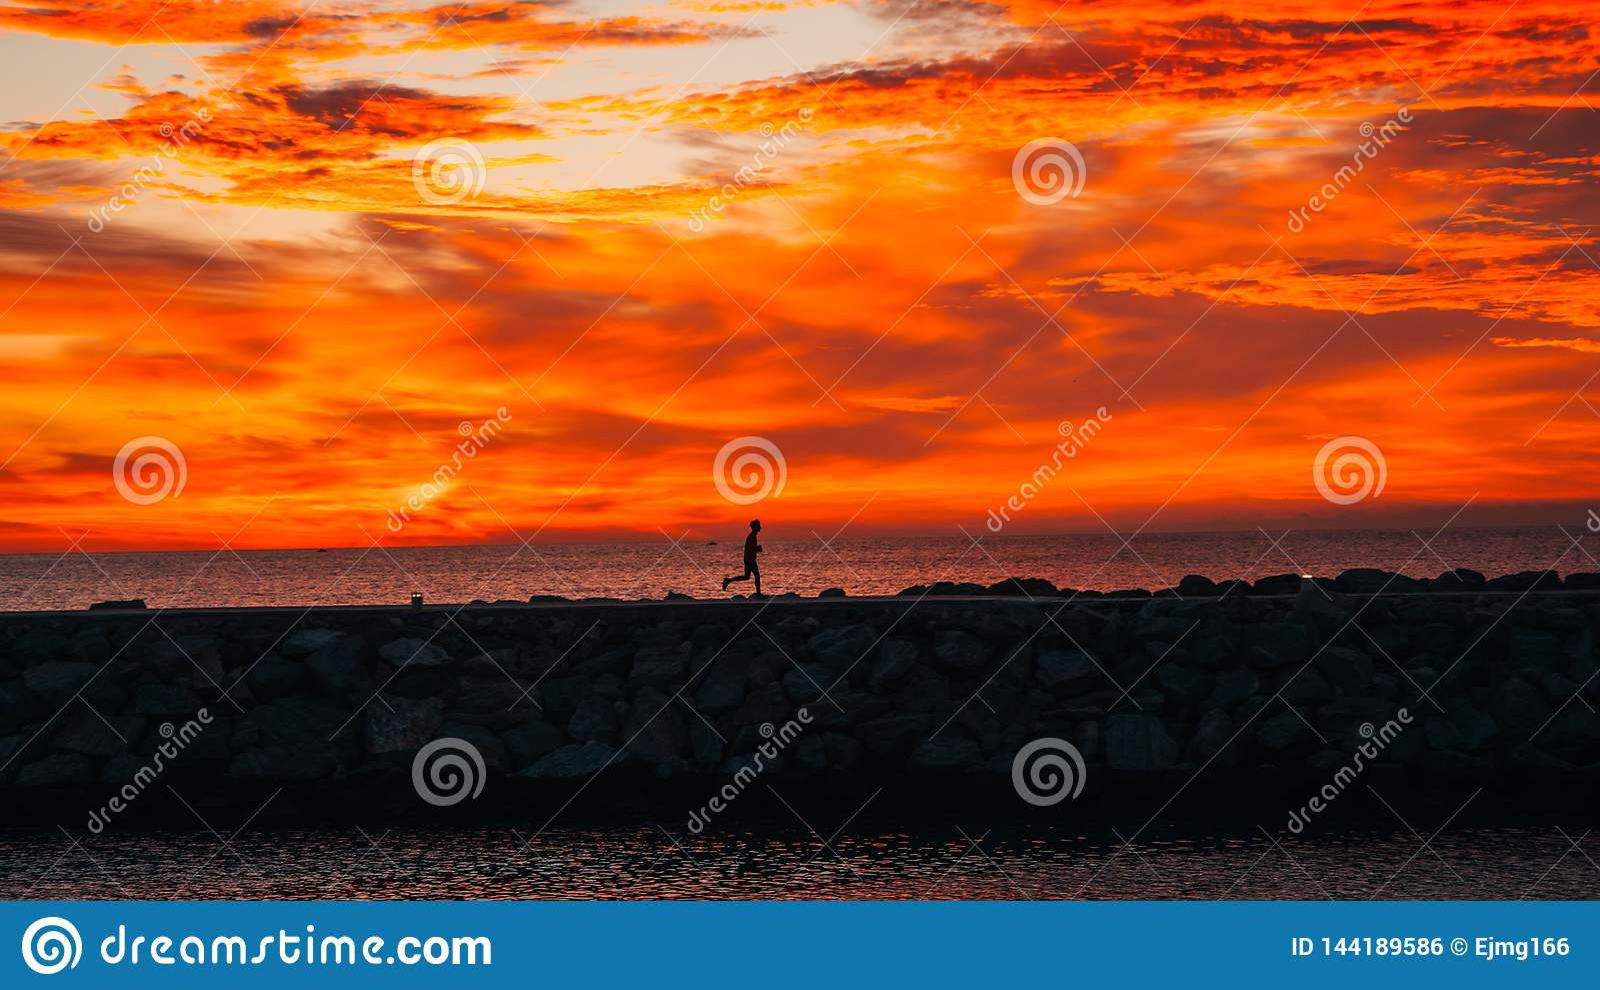 Бегун на восходе солнца бежать рядом с морем